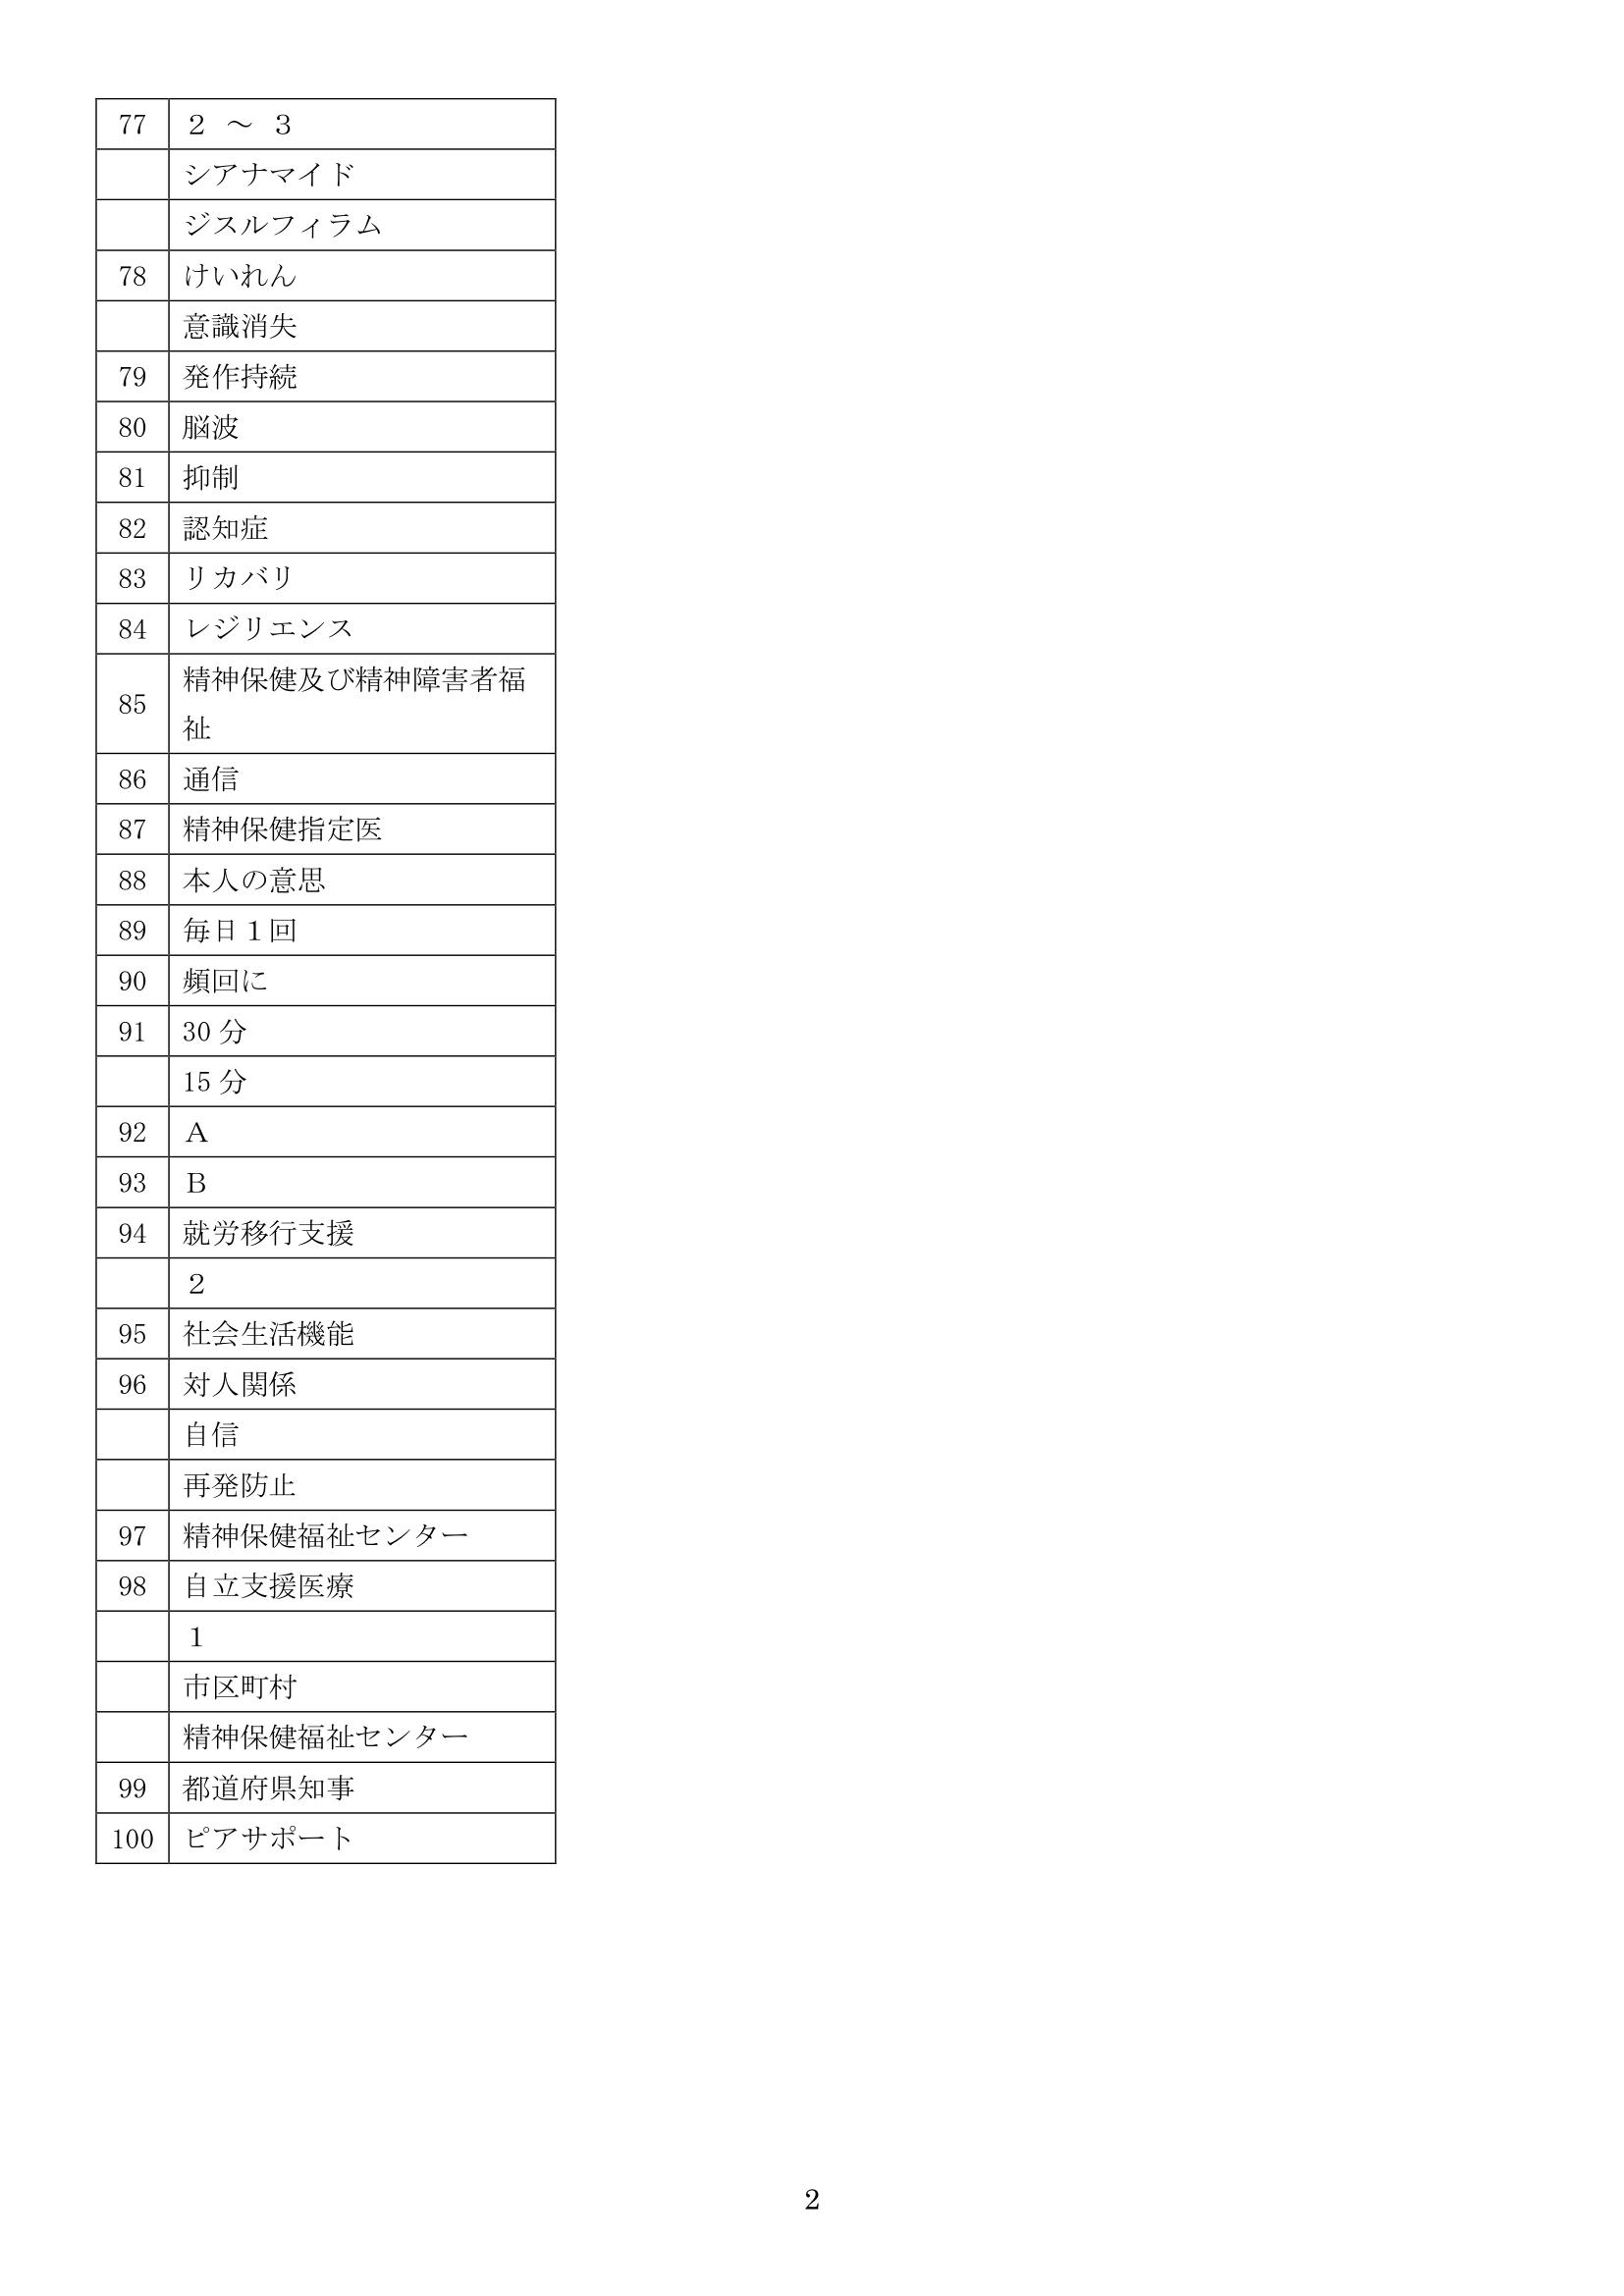 精神解答情報2